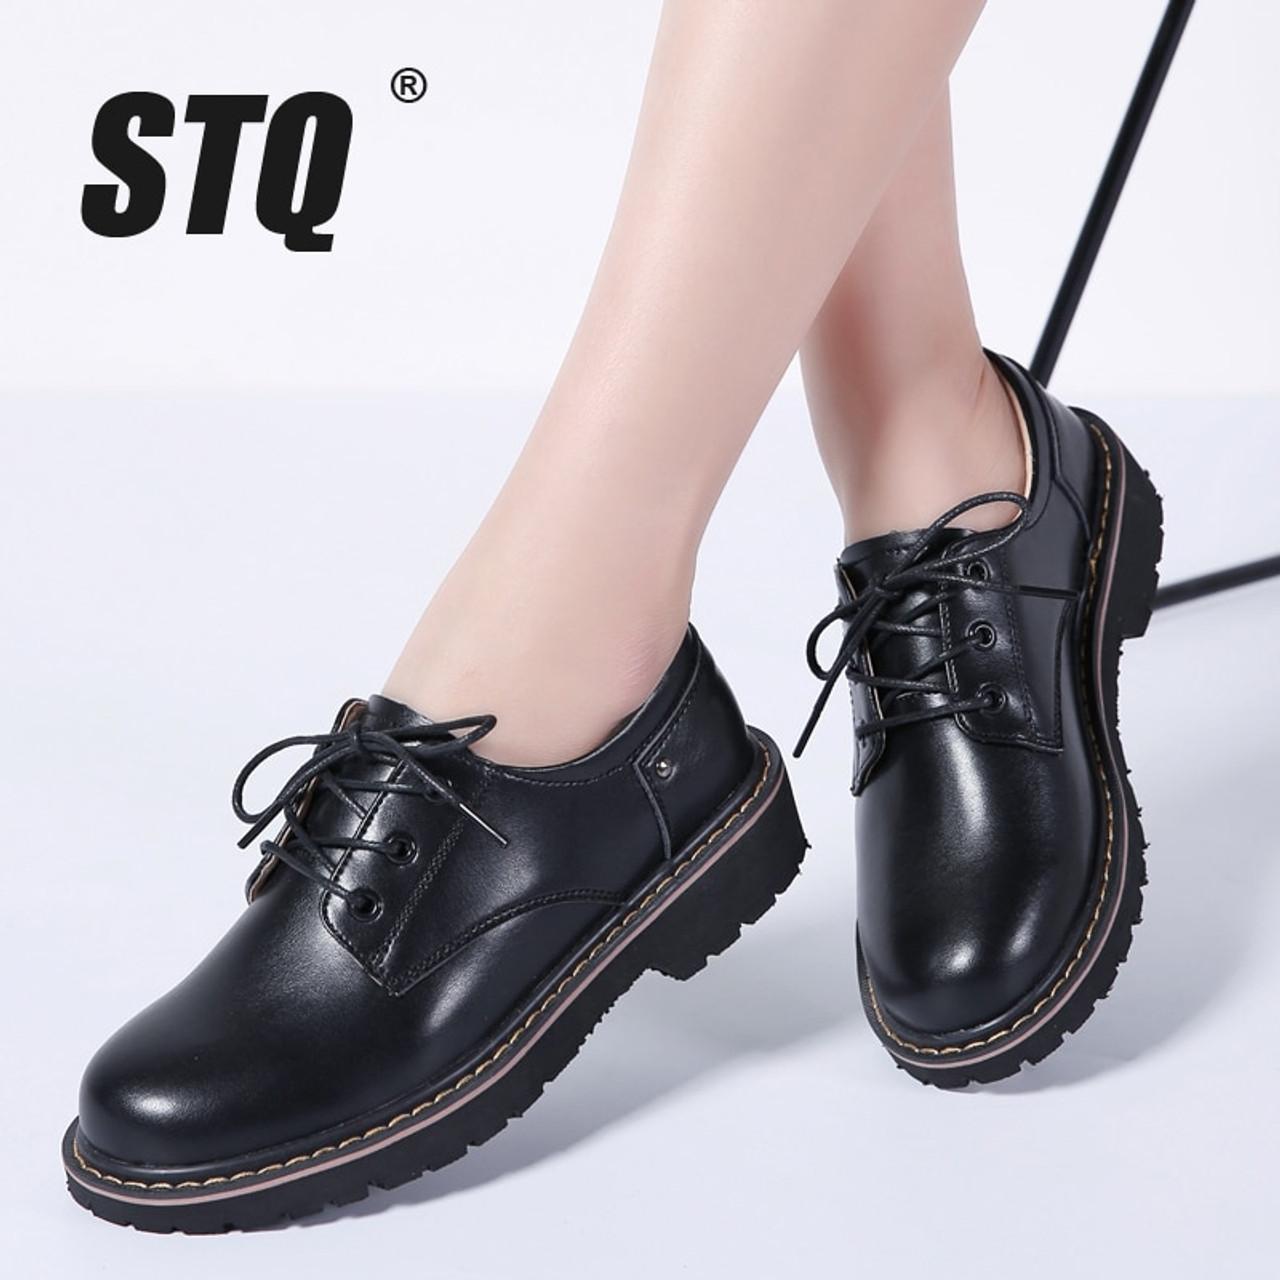 STQ 5 Autumn women oxford shoes casual flats dress black work shoes  women genuine Leather lace up boat shoes moccasins WF5